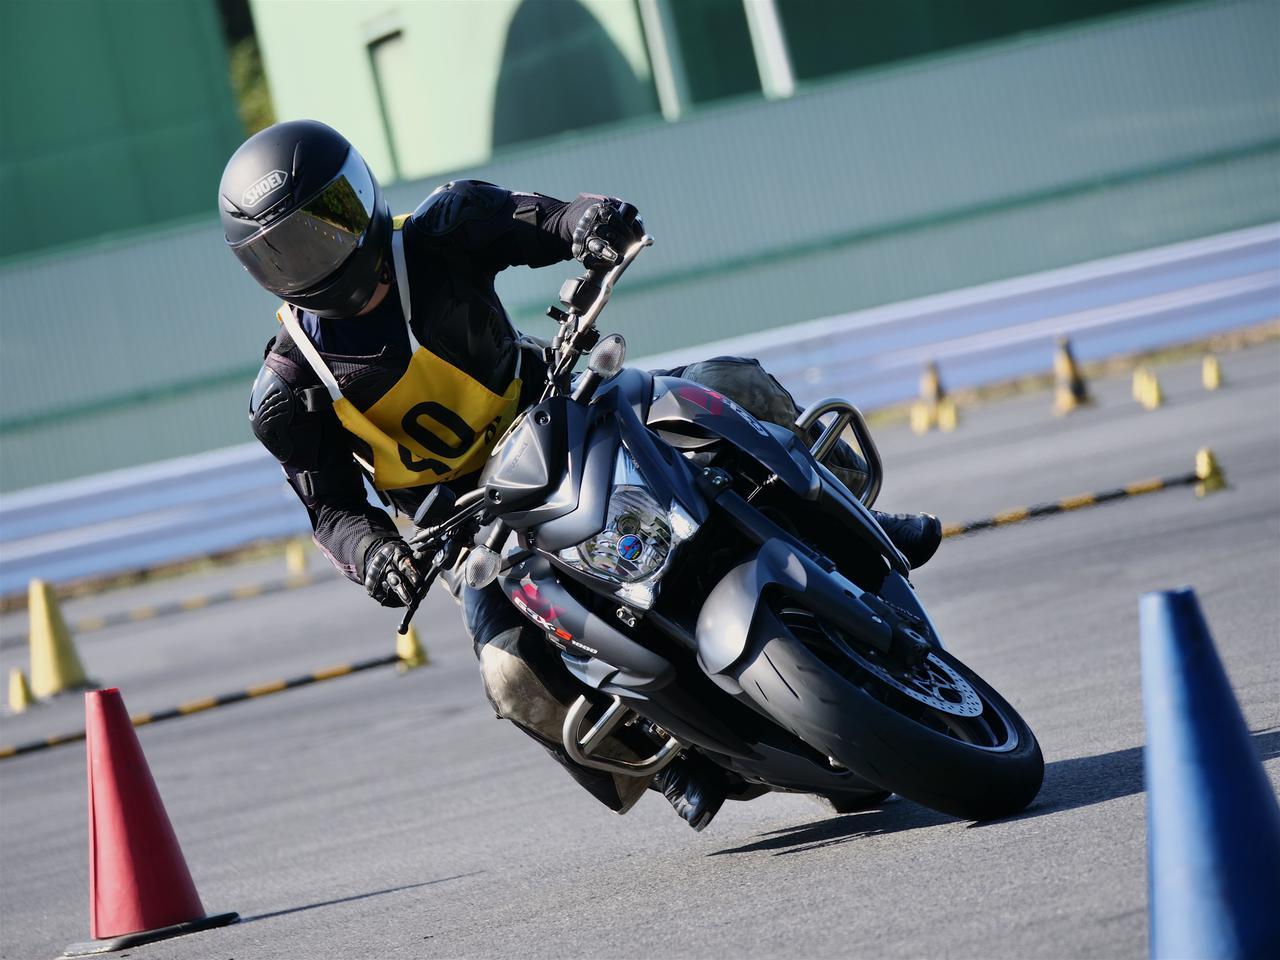 Images : 1番目の画像 - 2019ダンロップ・オートバイ杯ジムカーナ第5戦 - webオートバイ